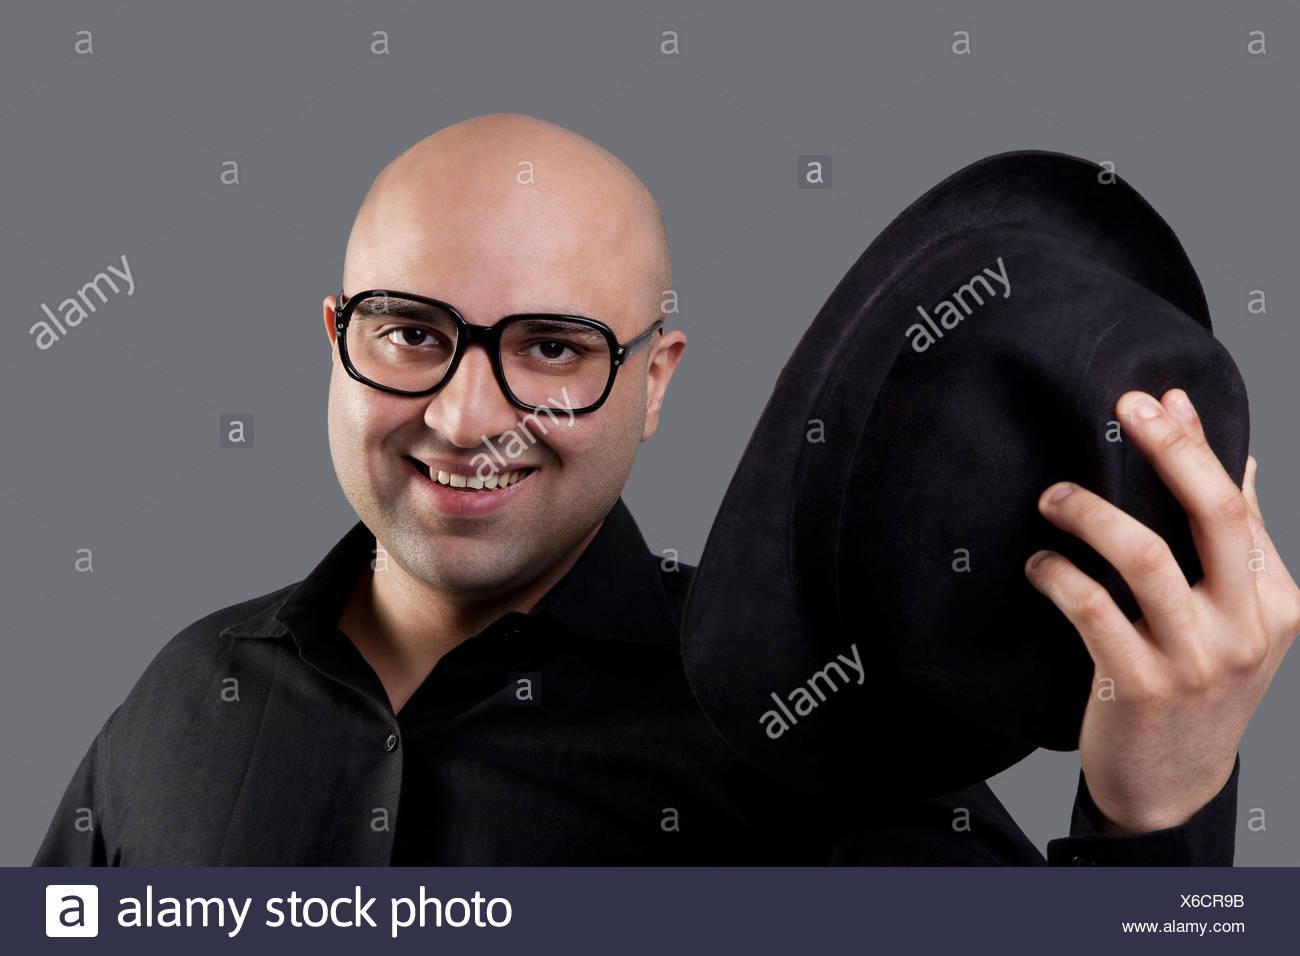 Bald man taking off his hat - Stock Image